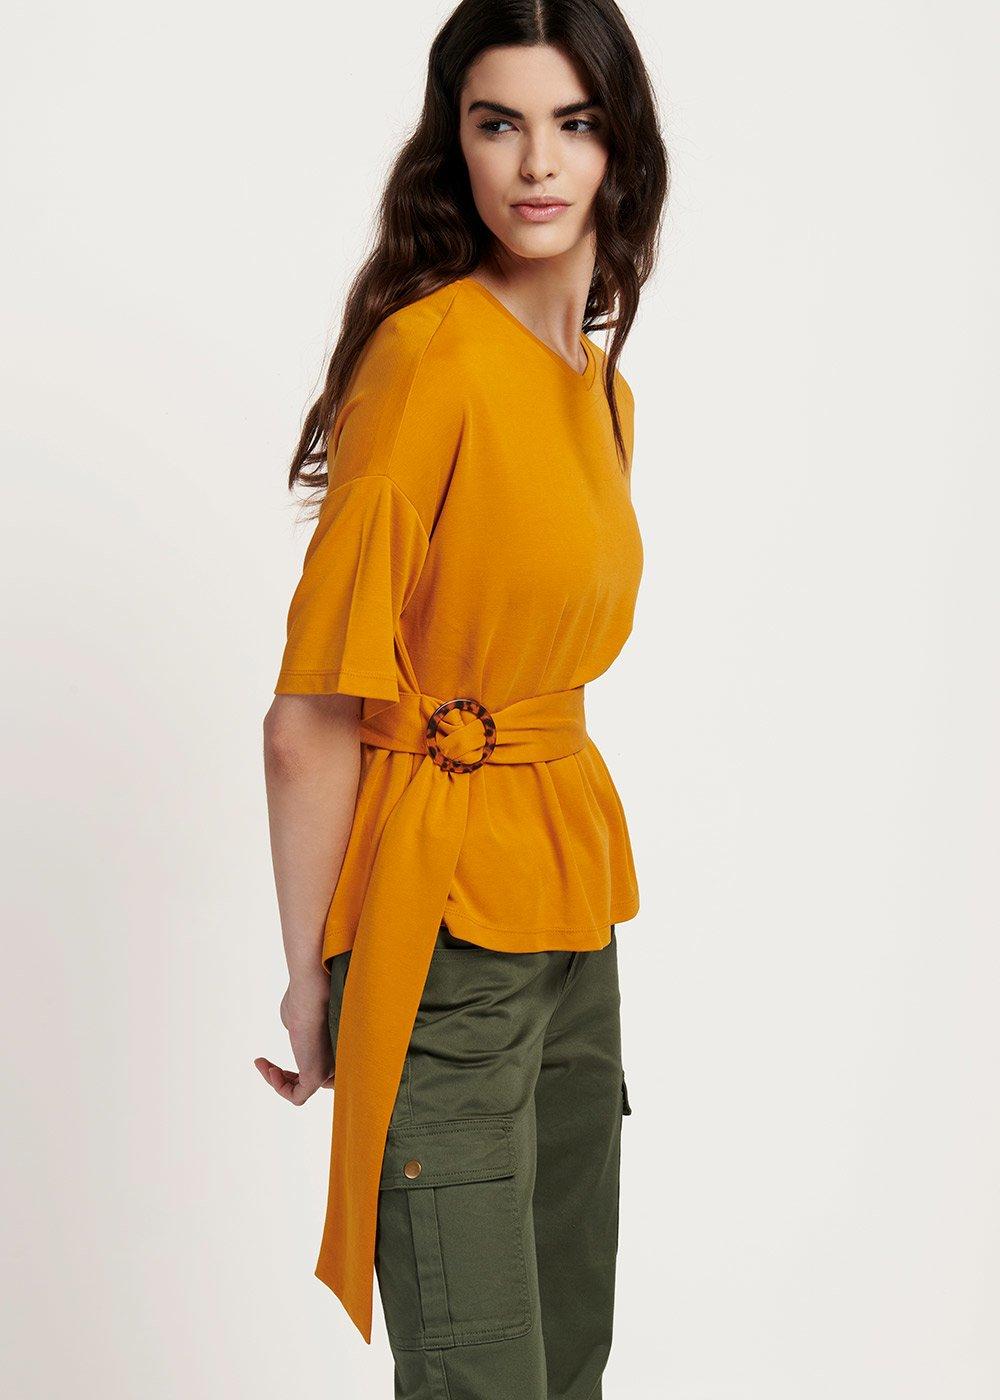 Sindy t-shirt with belt around the waist - Turmeric - Woman